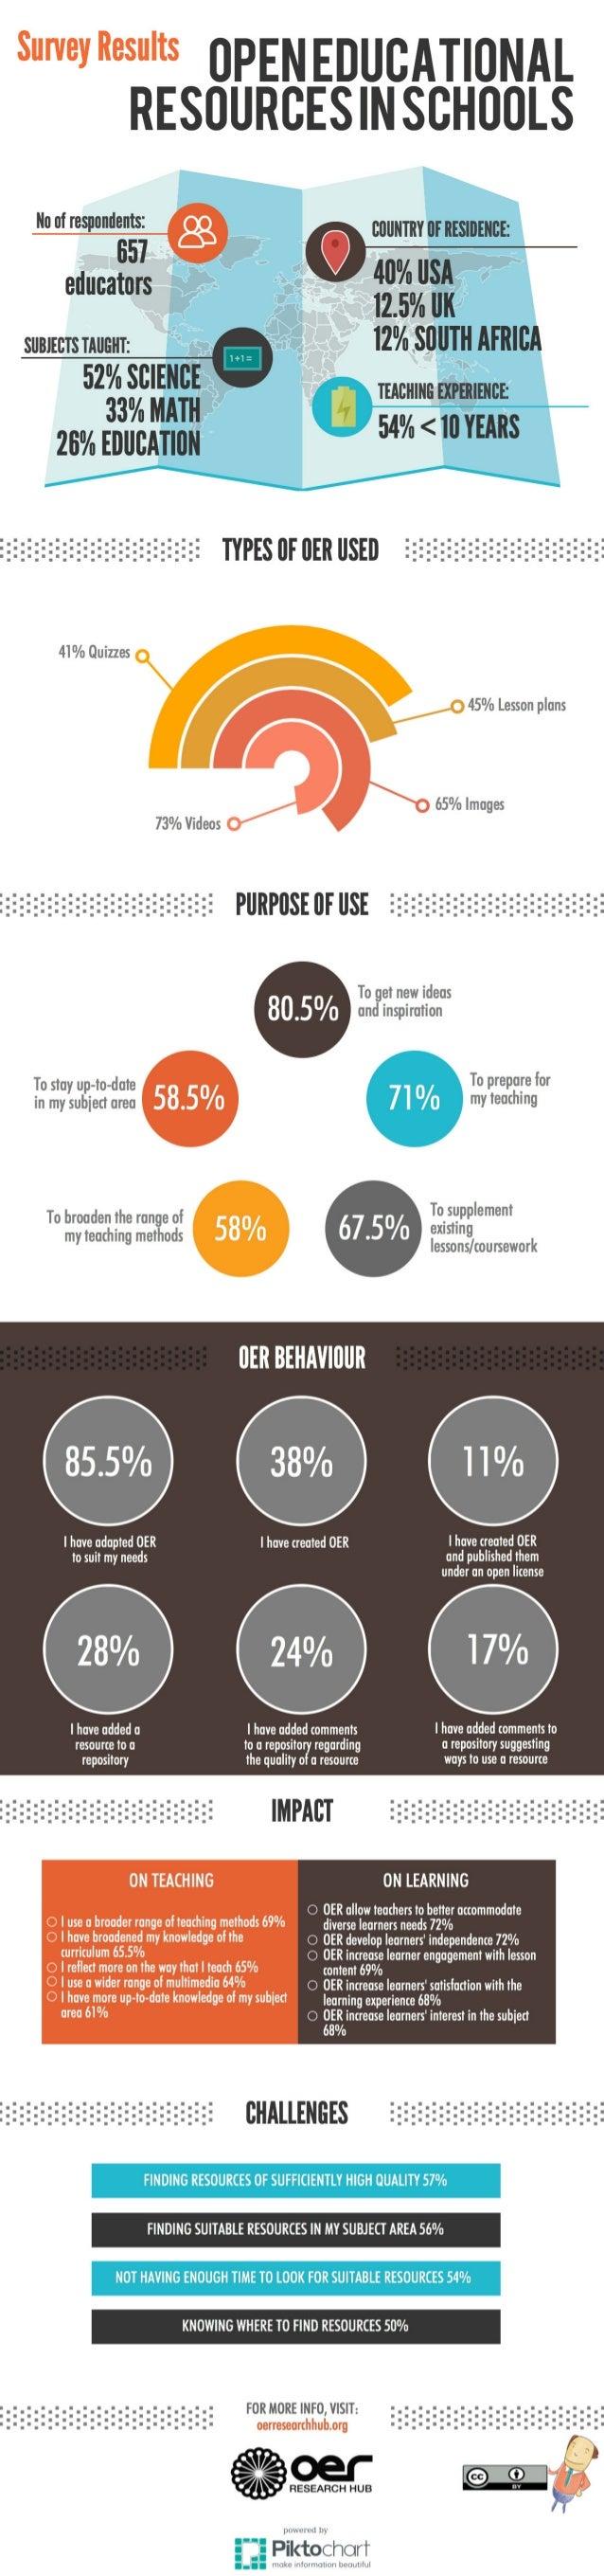 "Siuevieiits OPENEDUCATIONAL RESOURCESINSCHOOLS  """"°""°'l'""""""'; )['! '3 g @ couuiiiroriitsiutuct:  40% IISA  educators 1250/..."